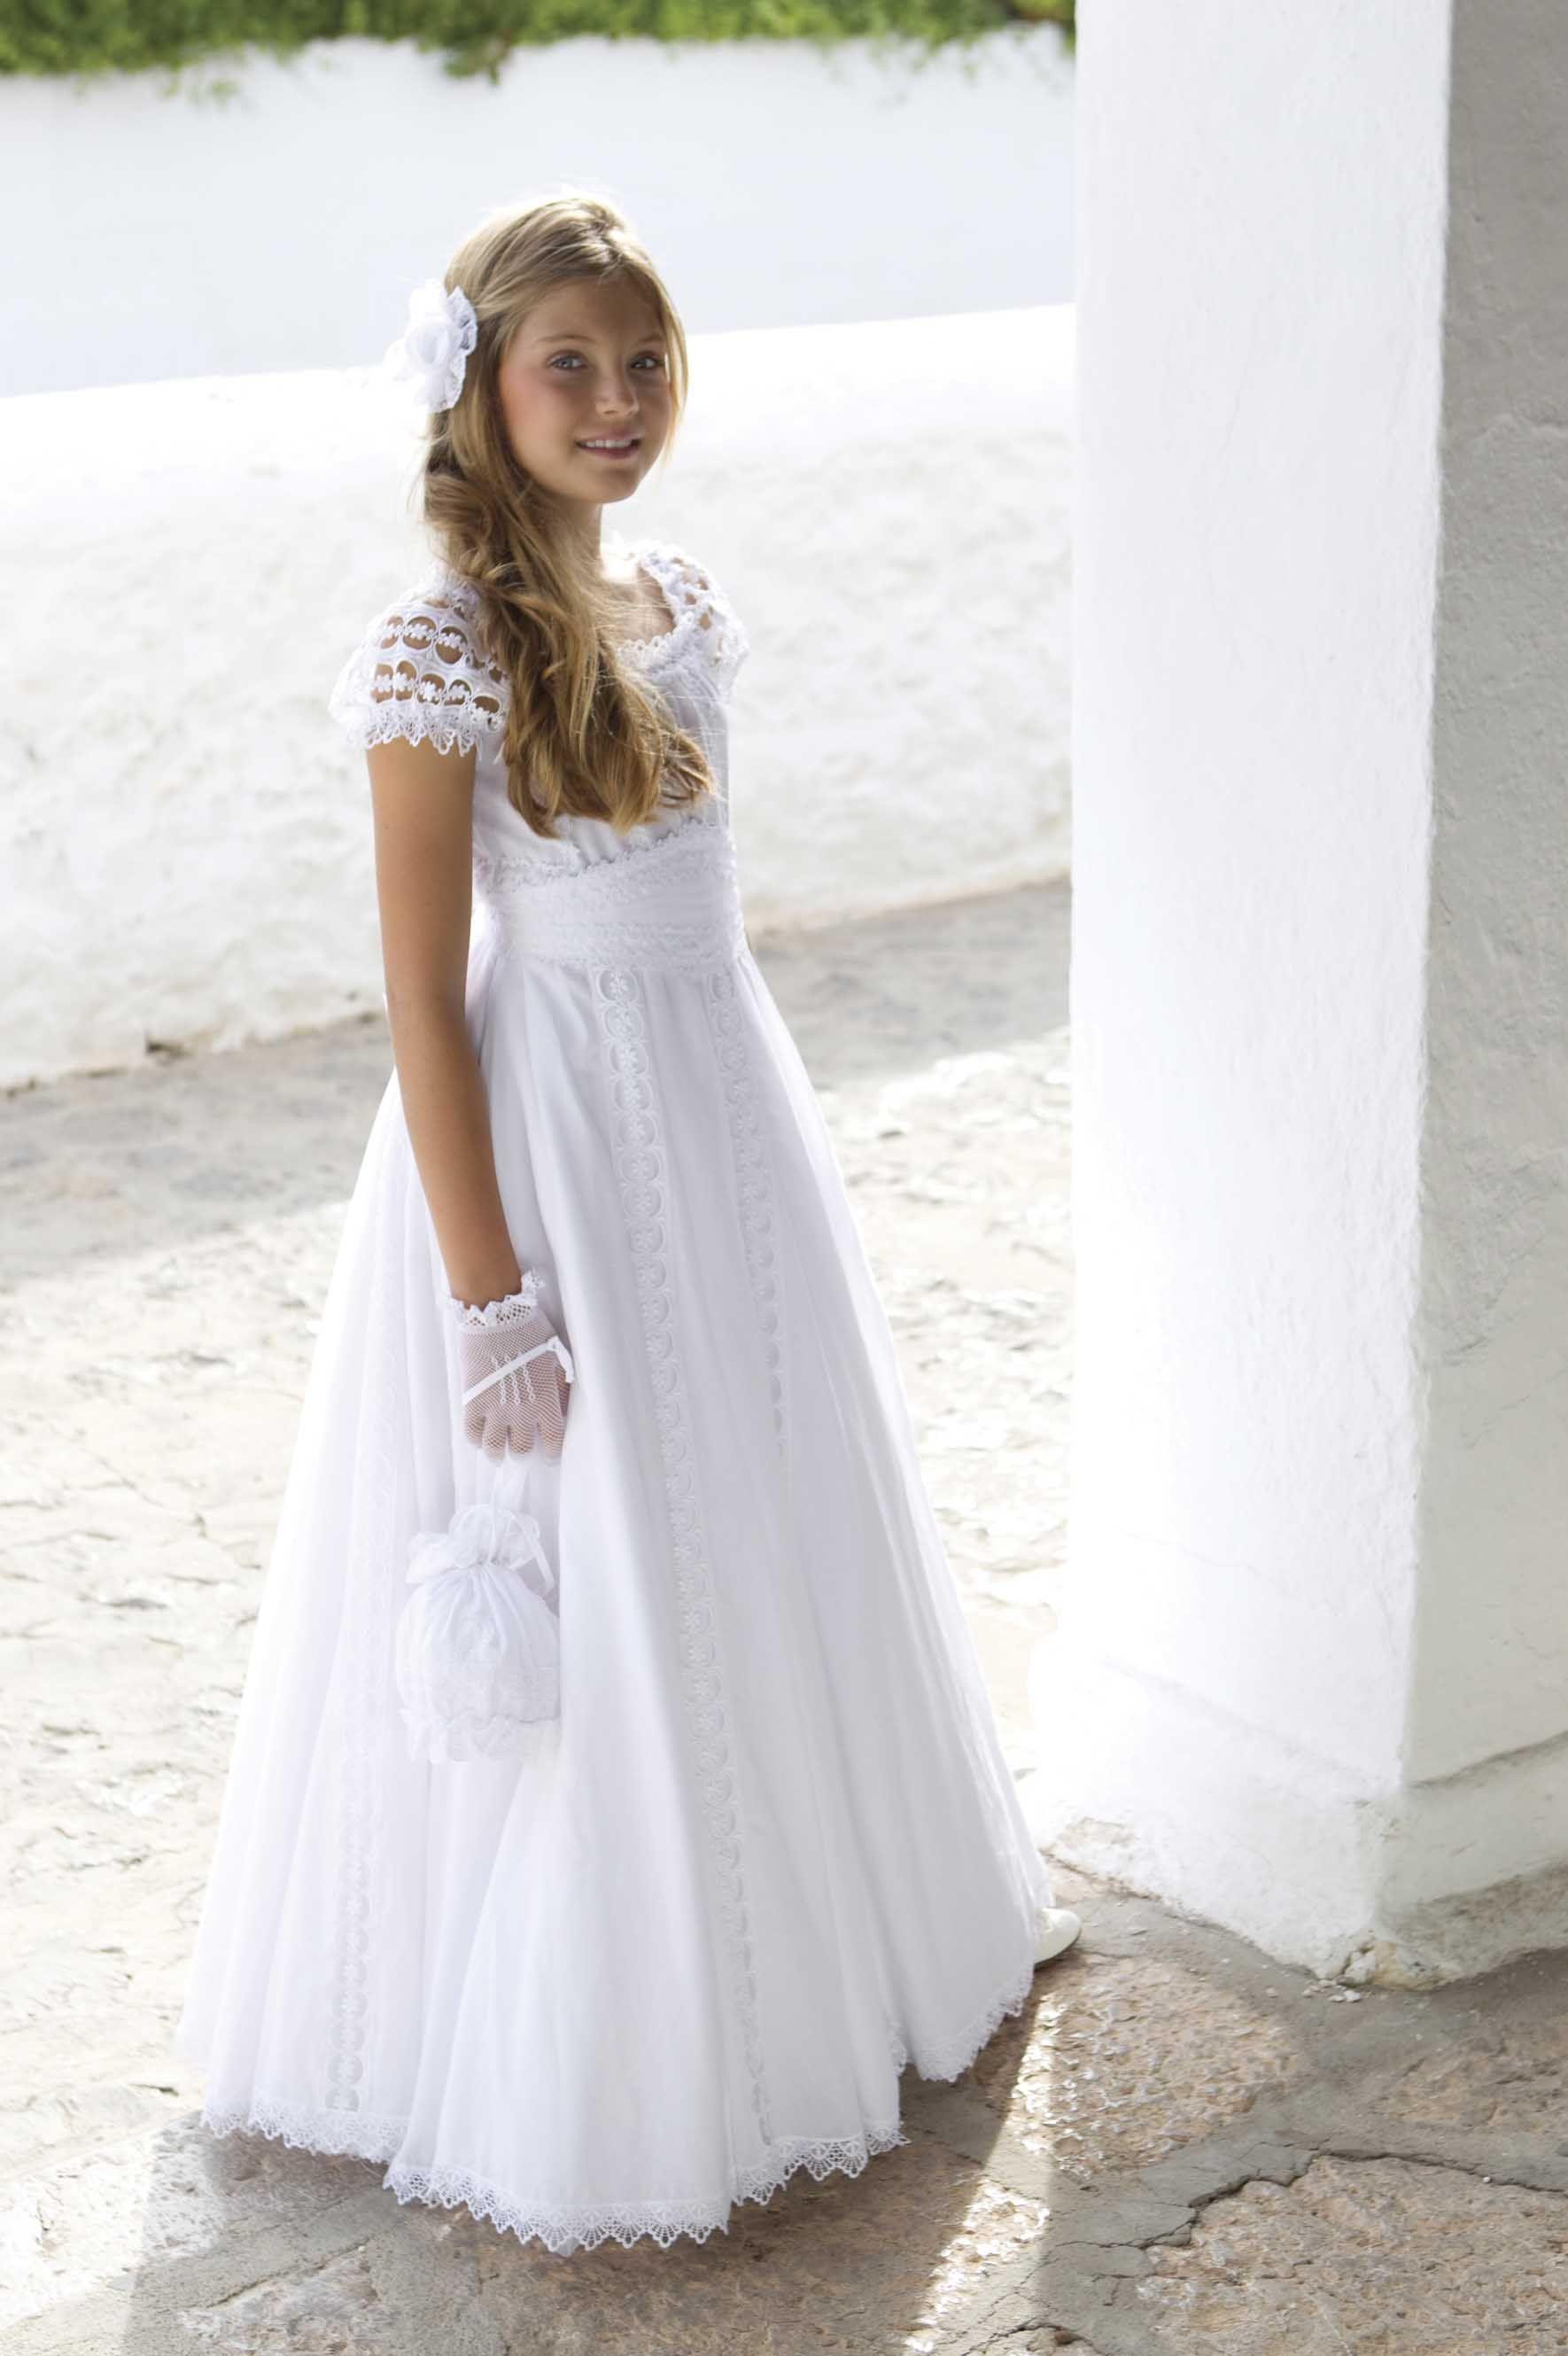 Vestido Blancanieves : CHARO RUIZ IBIZA. Moda adlib de Ibiza y ...